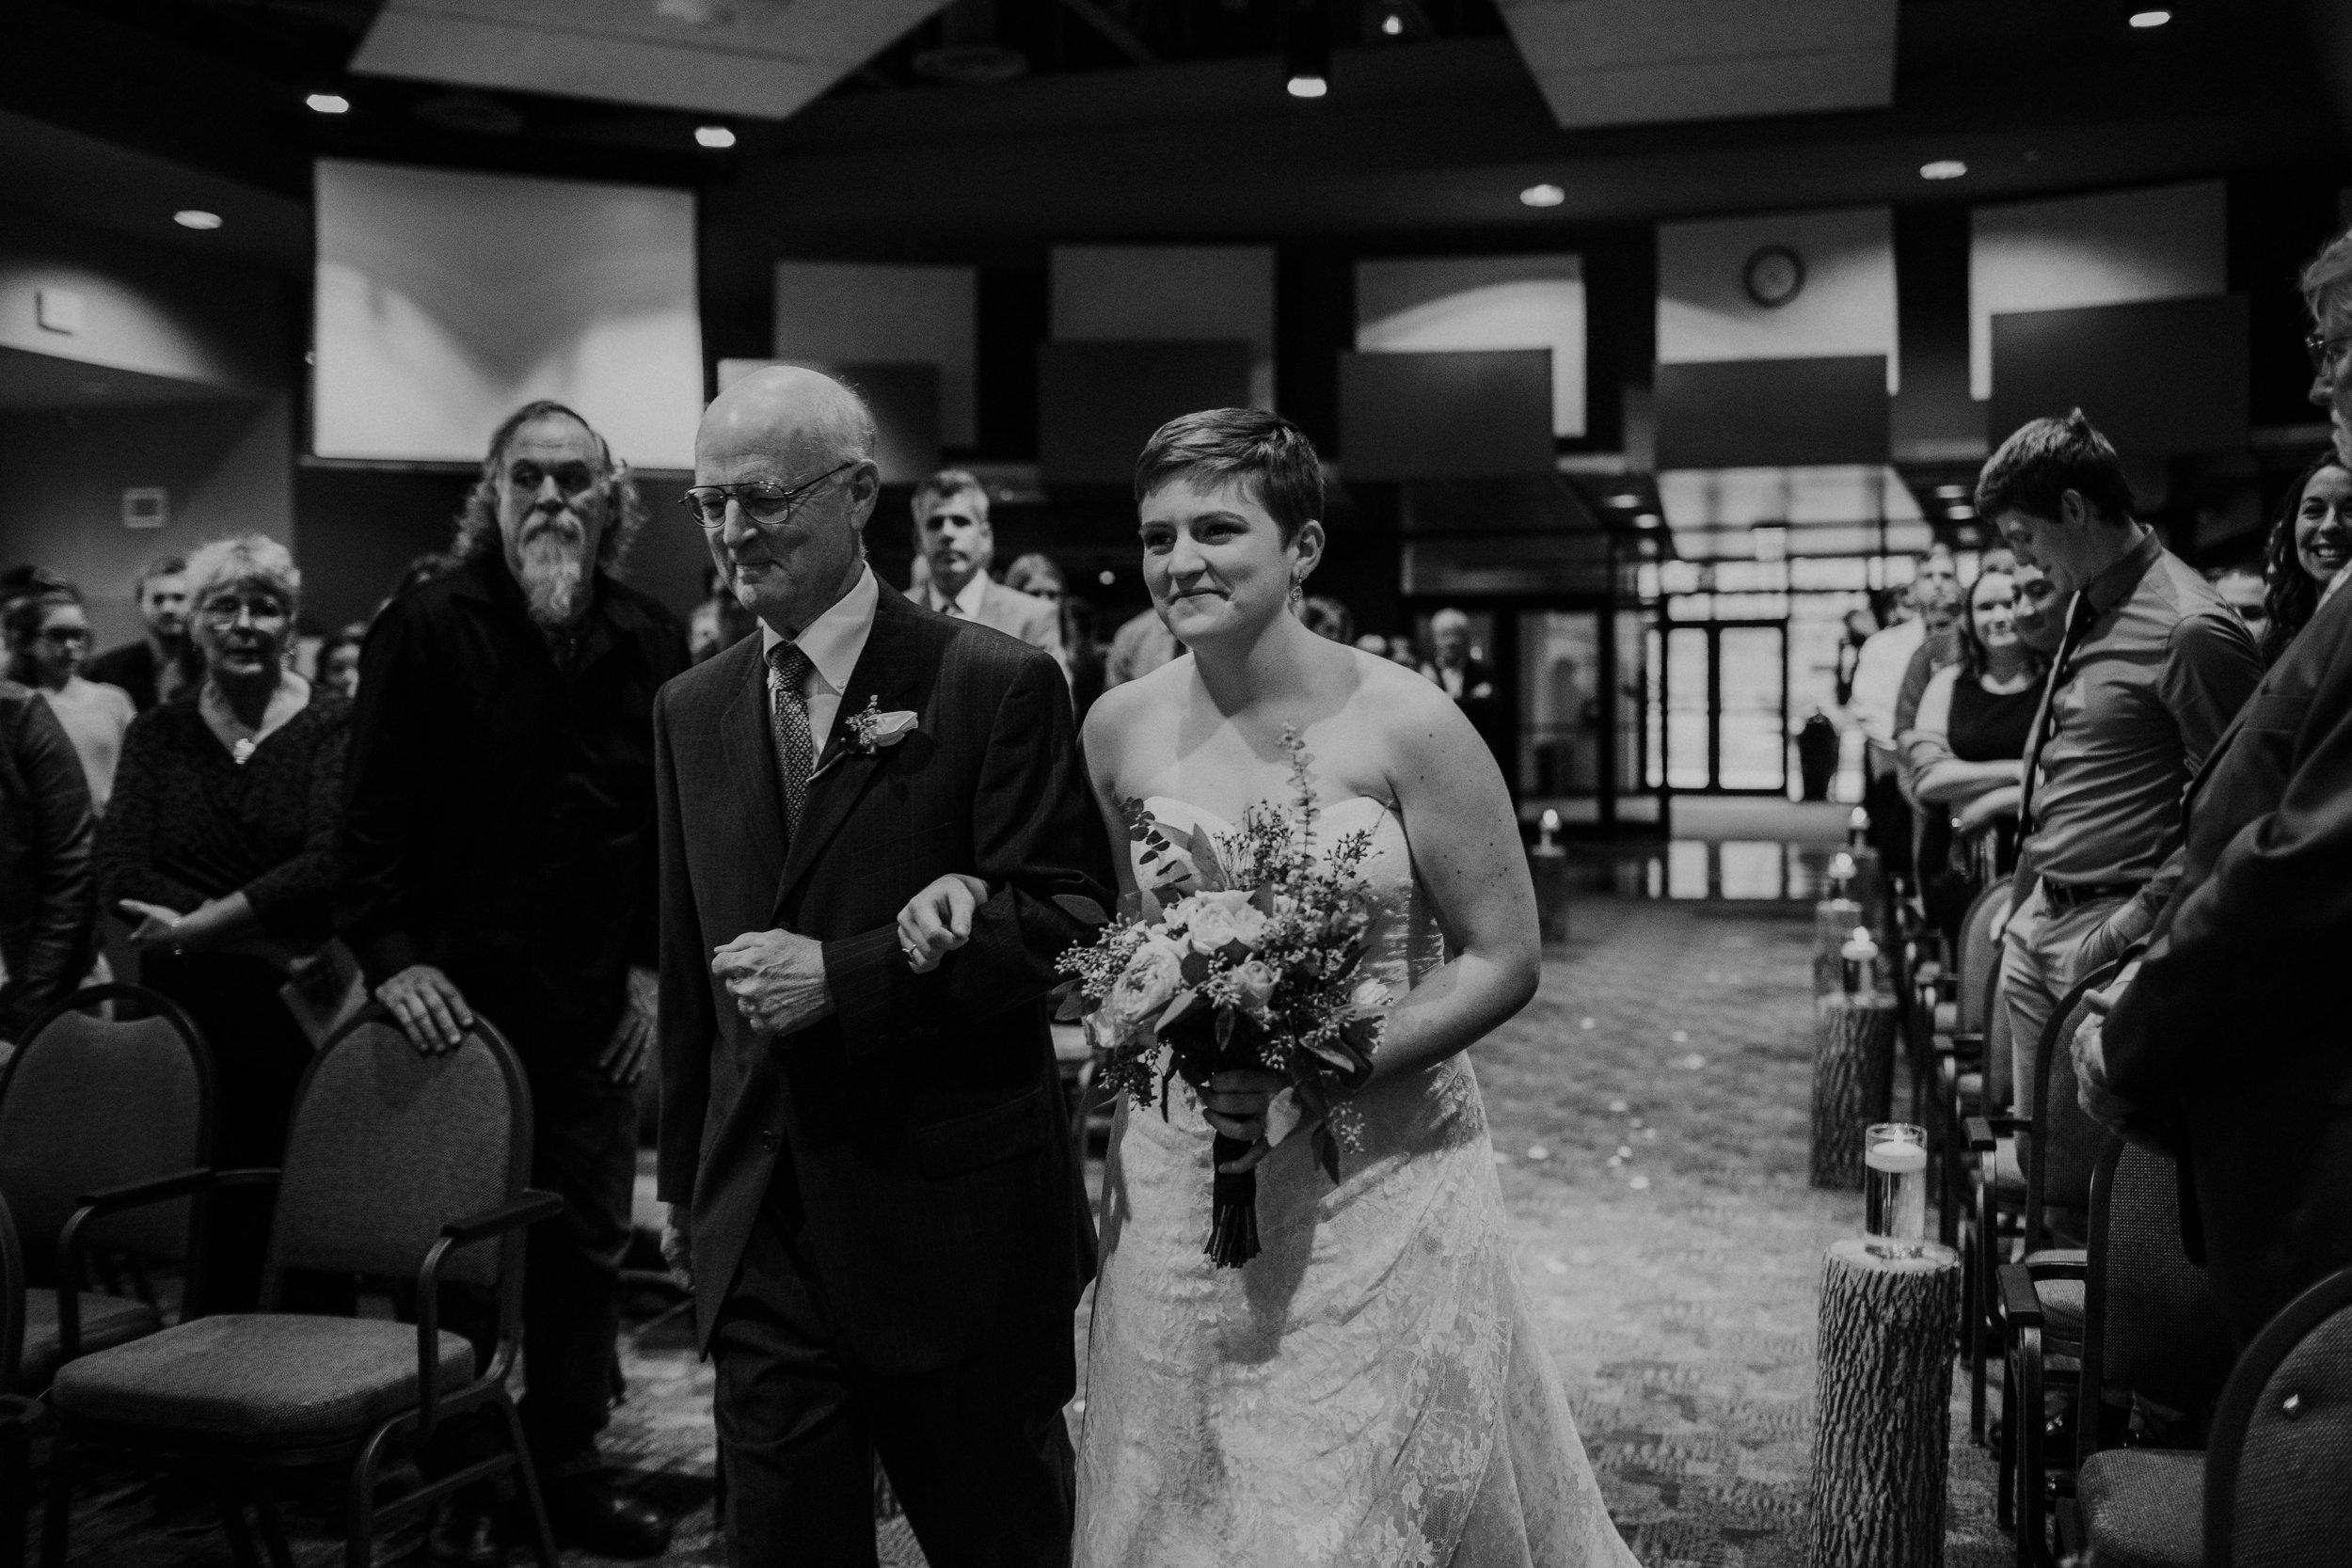 Columbus ohio wedding photographer grace e jones photography real fun joyful wedding108.jpg